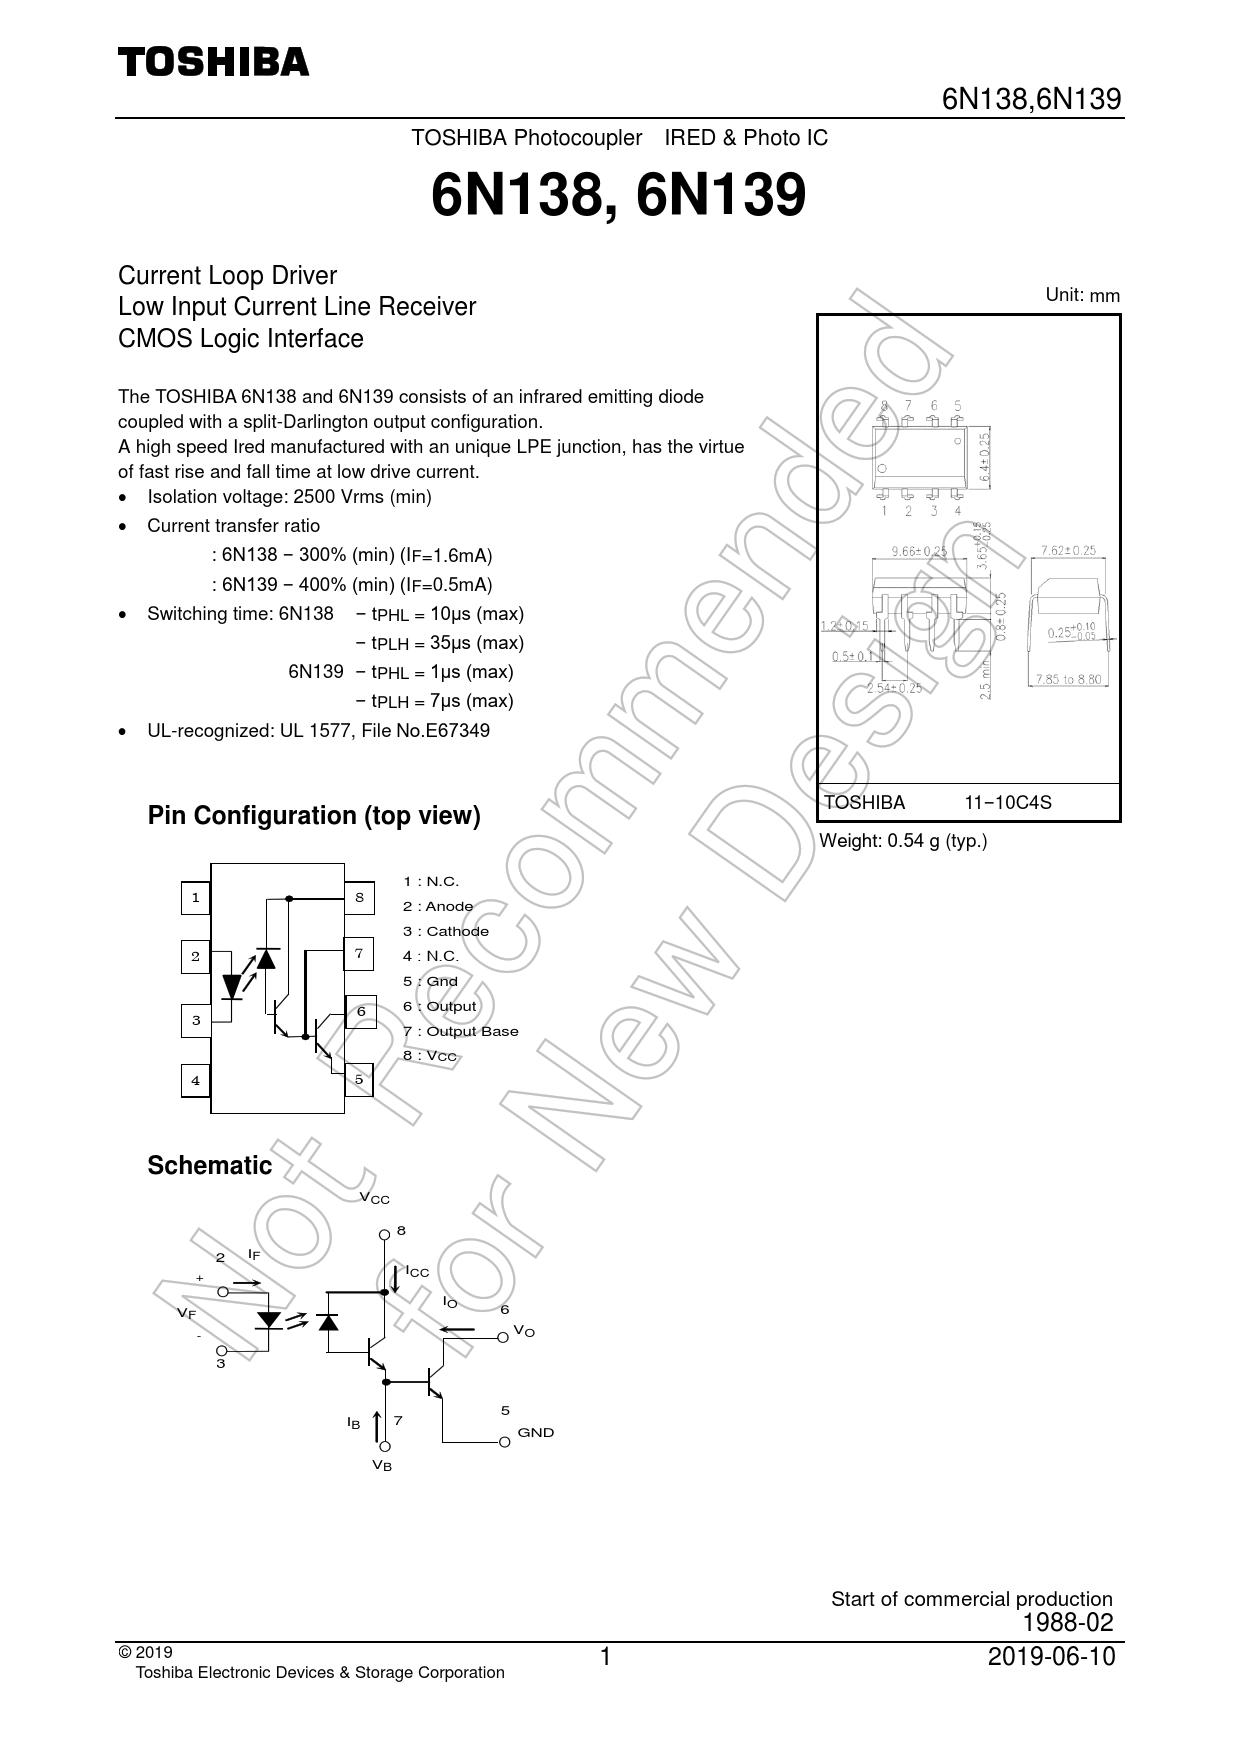 Datasheet 6N138, 6N139 Toshiba